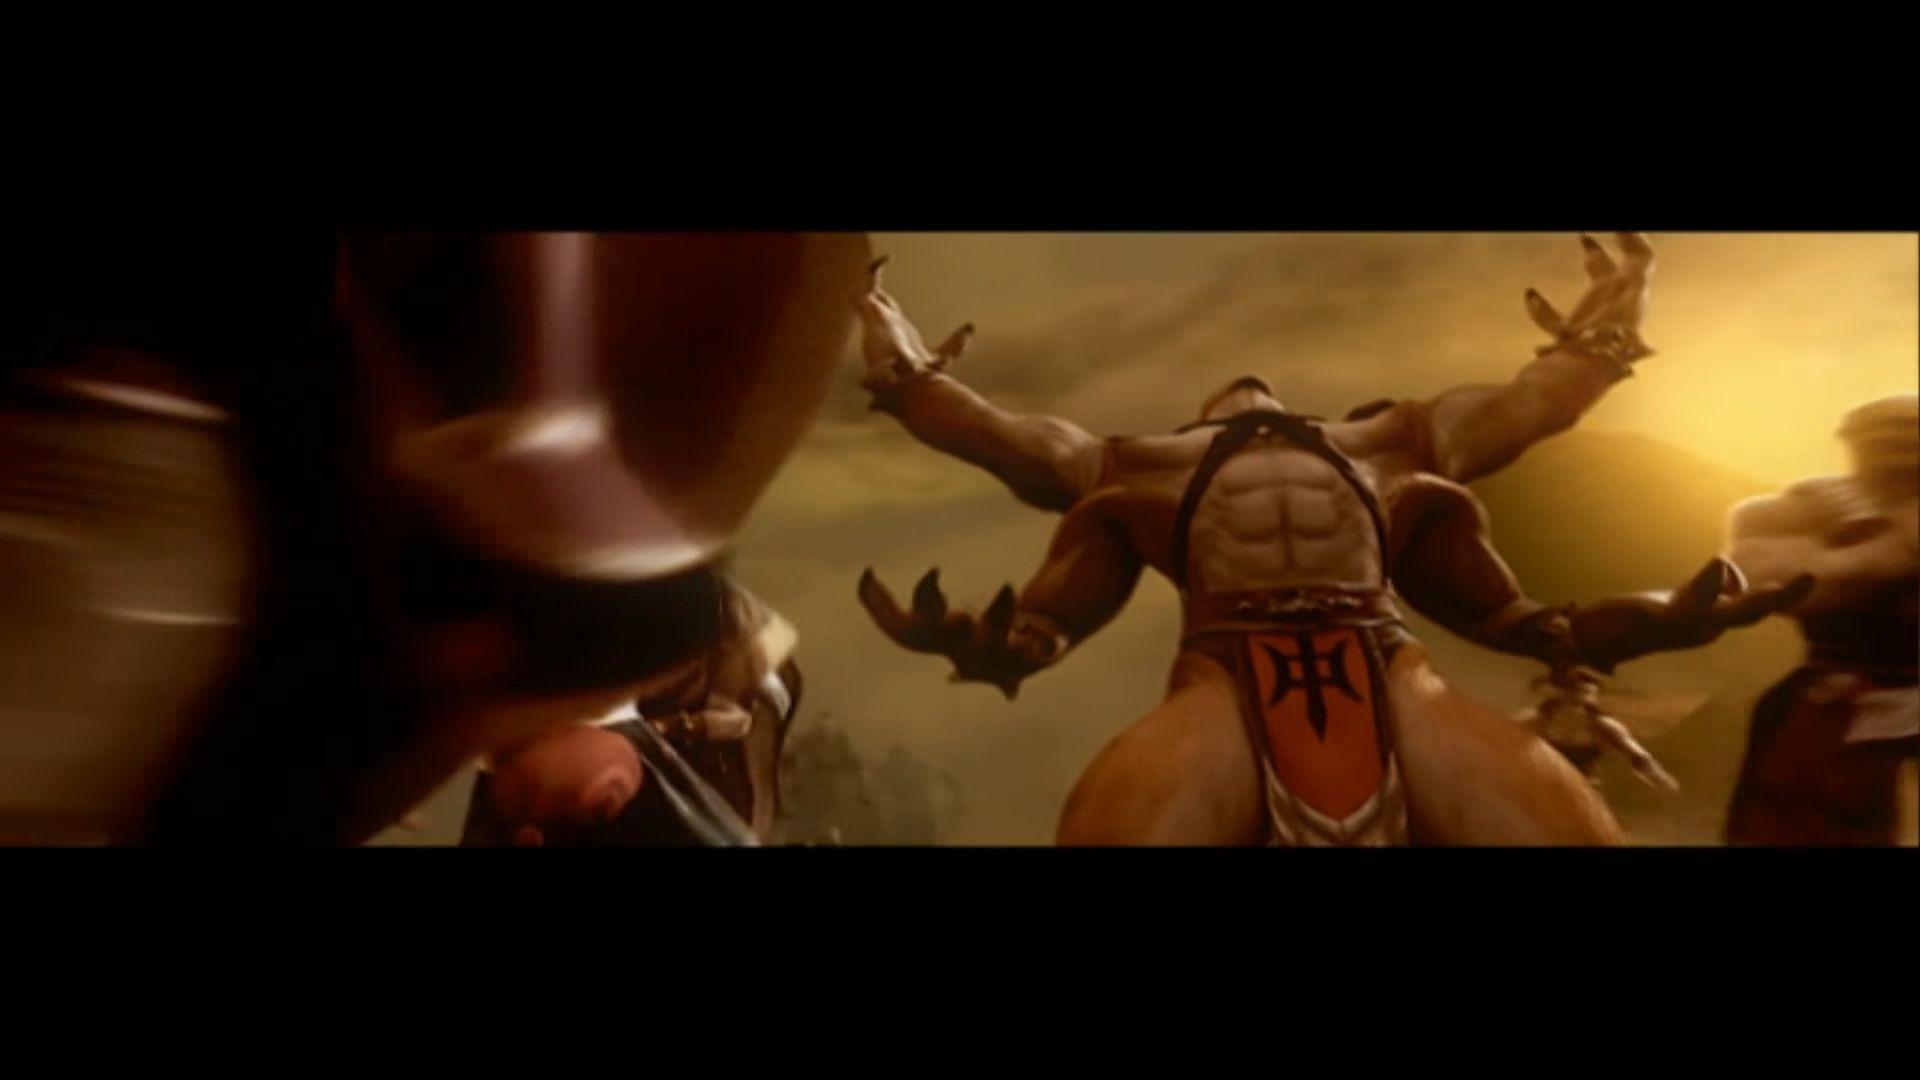 Mortal Kombat: Armageddon Download - Old Games Download